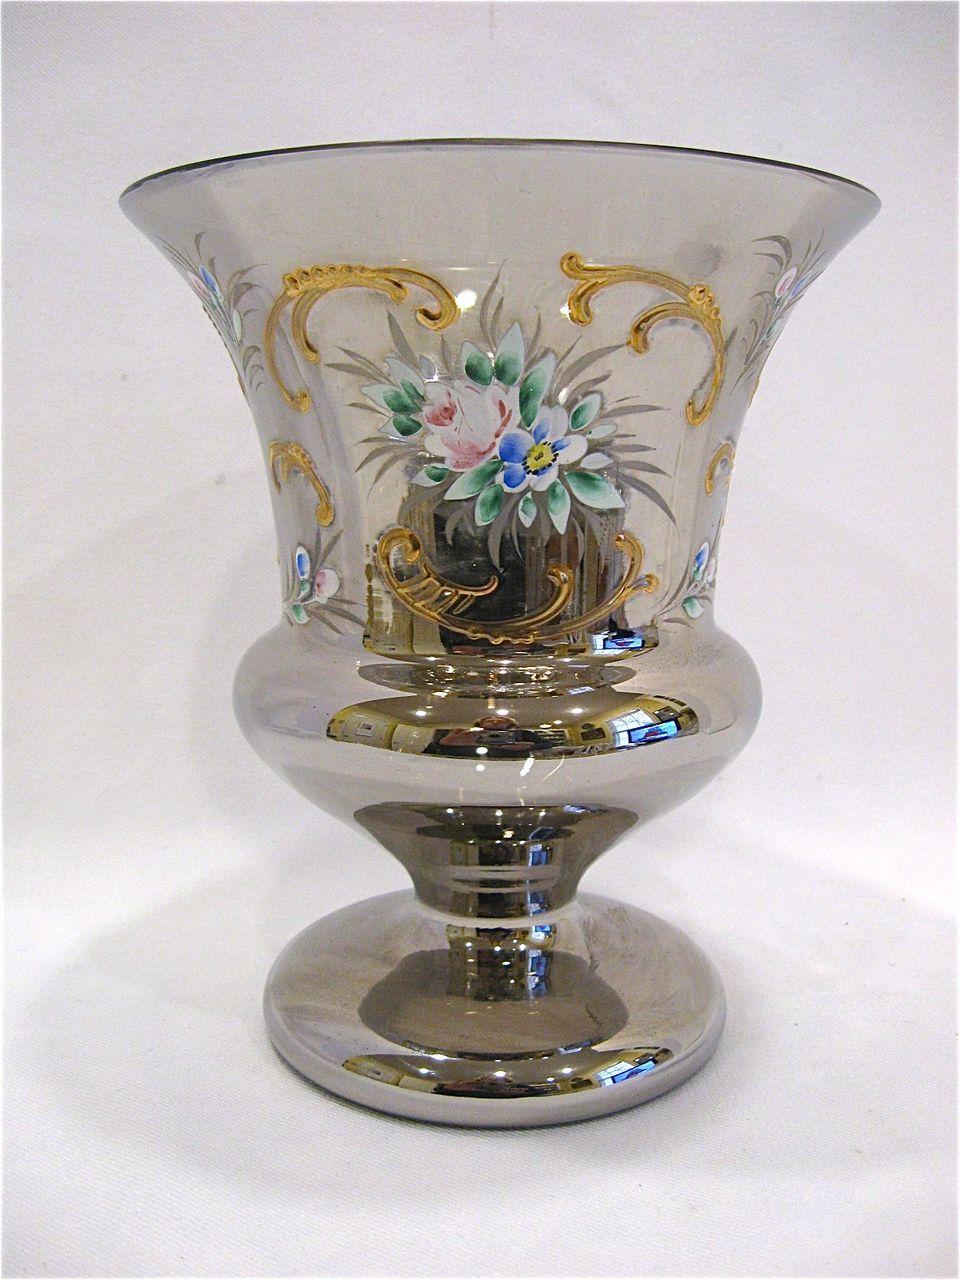 Vases Coloured Gl Art Deco Belgium The Uk S Premier Antiques